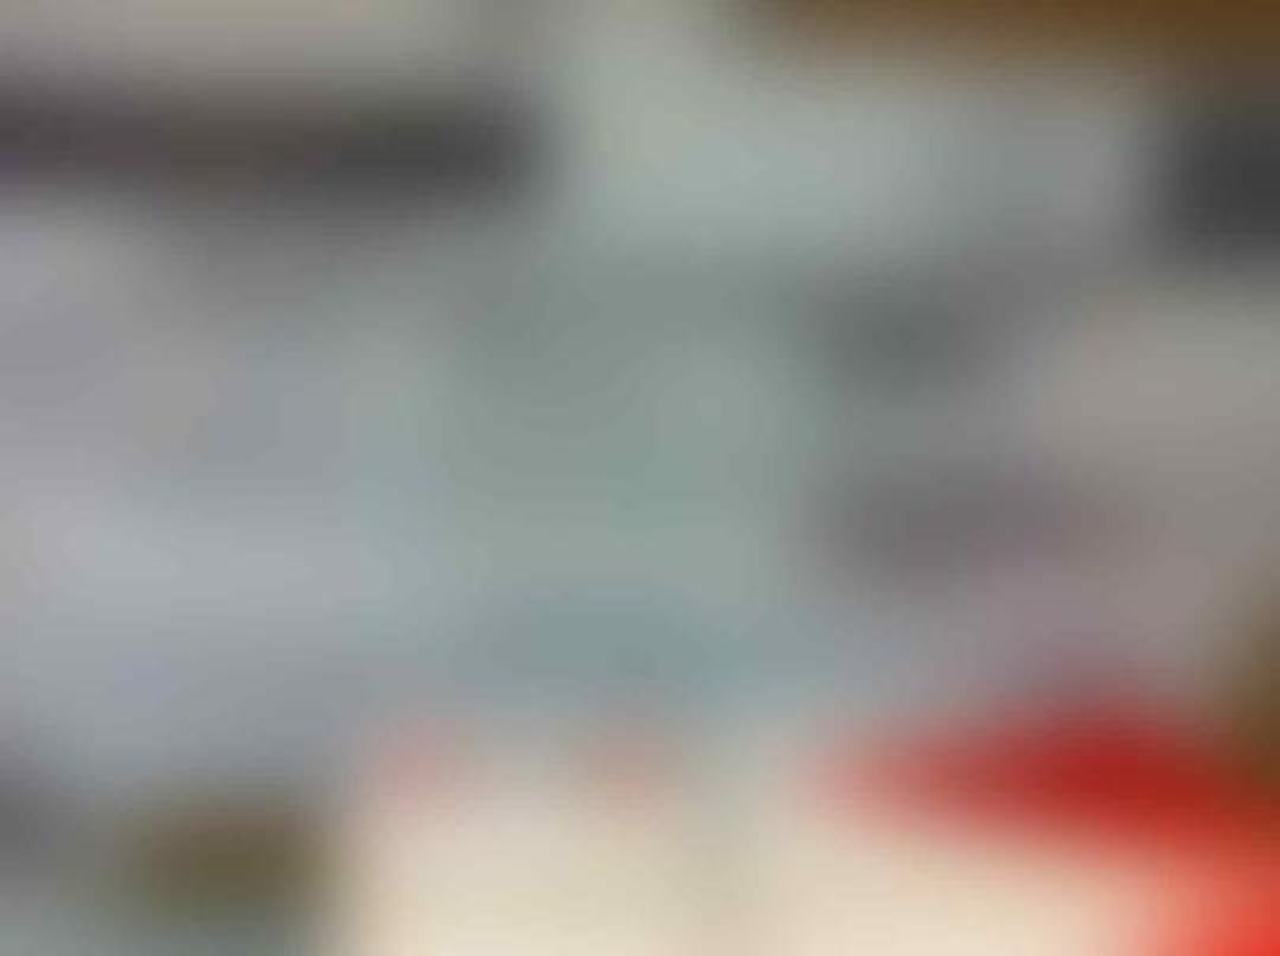 Jasa Order Pembelian Amazon | Fee Rp 10.000 | Recomended Seller